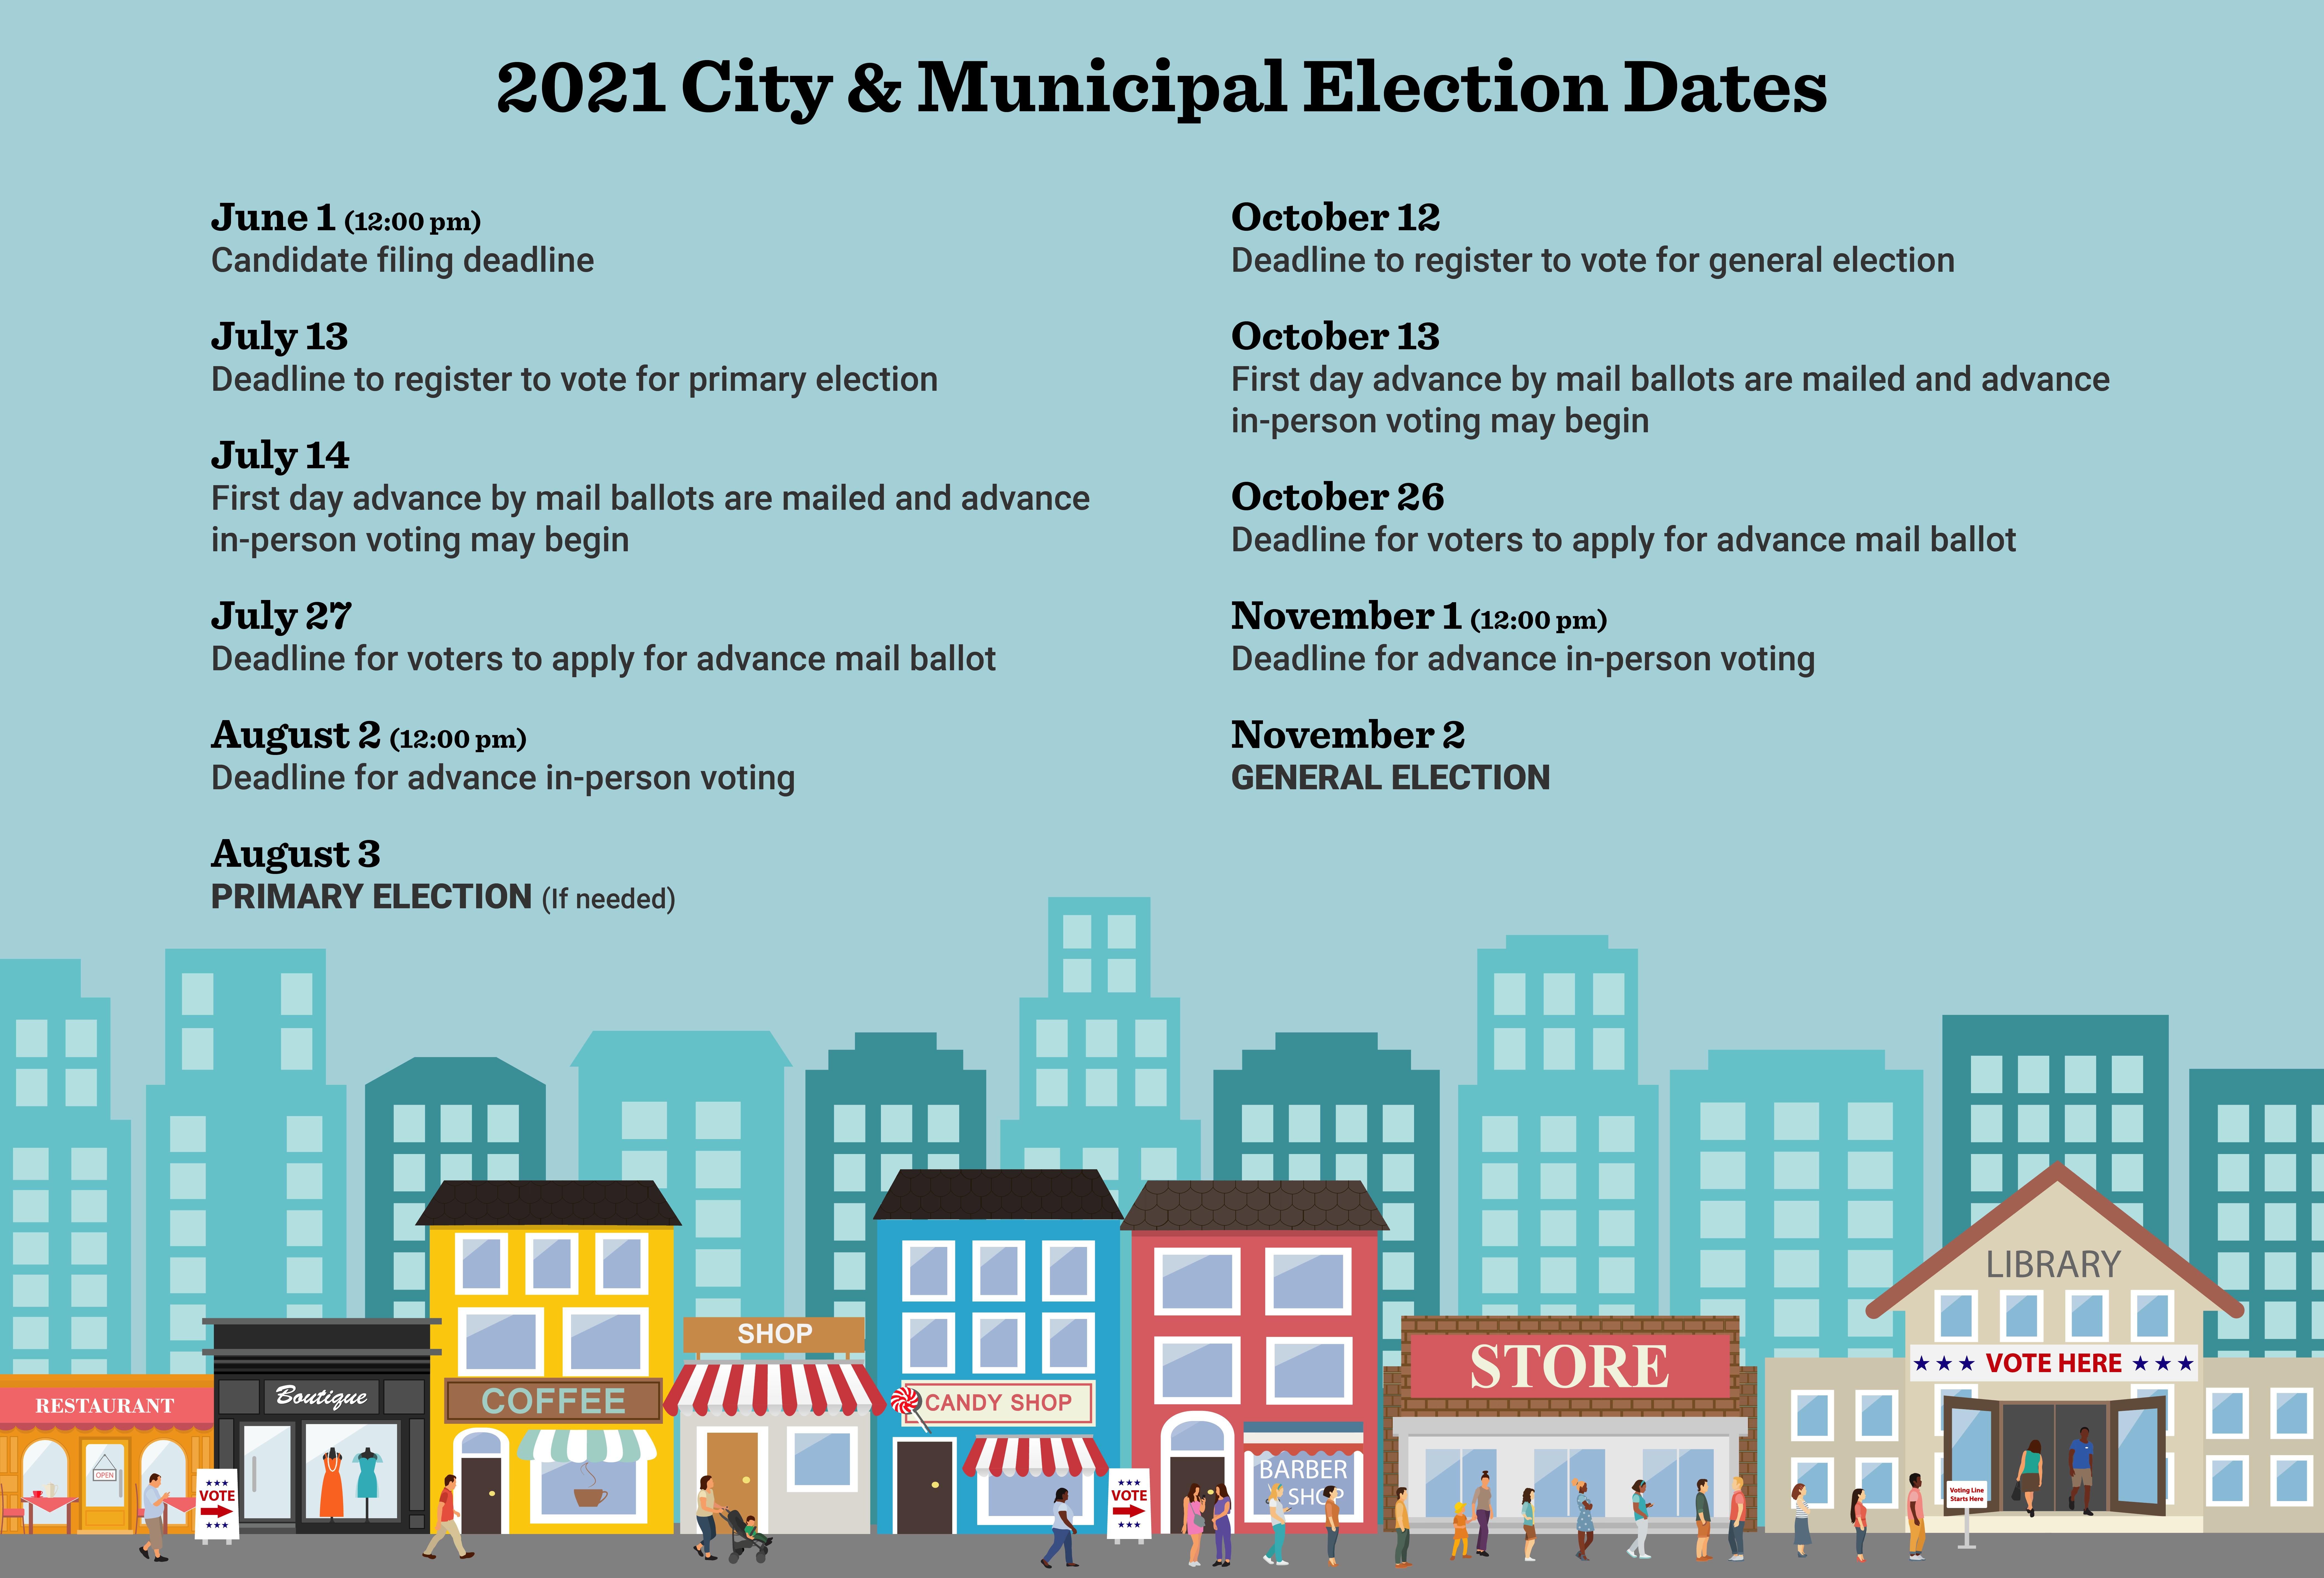 2021-Election-Dates-04-23-21